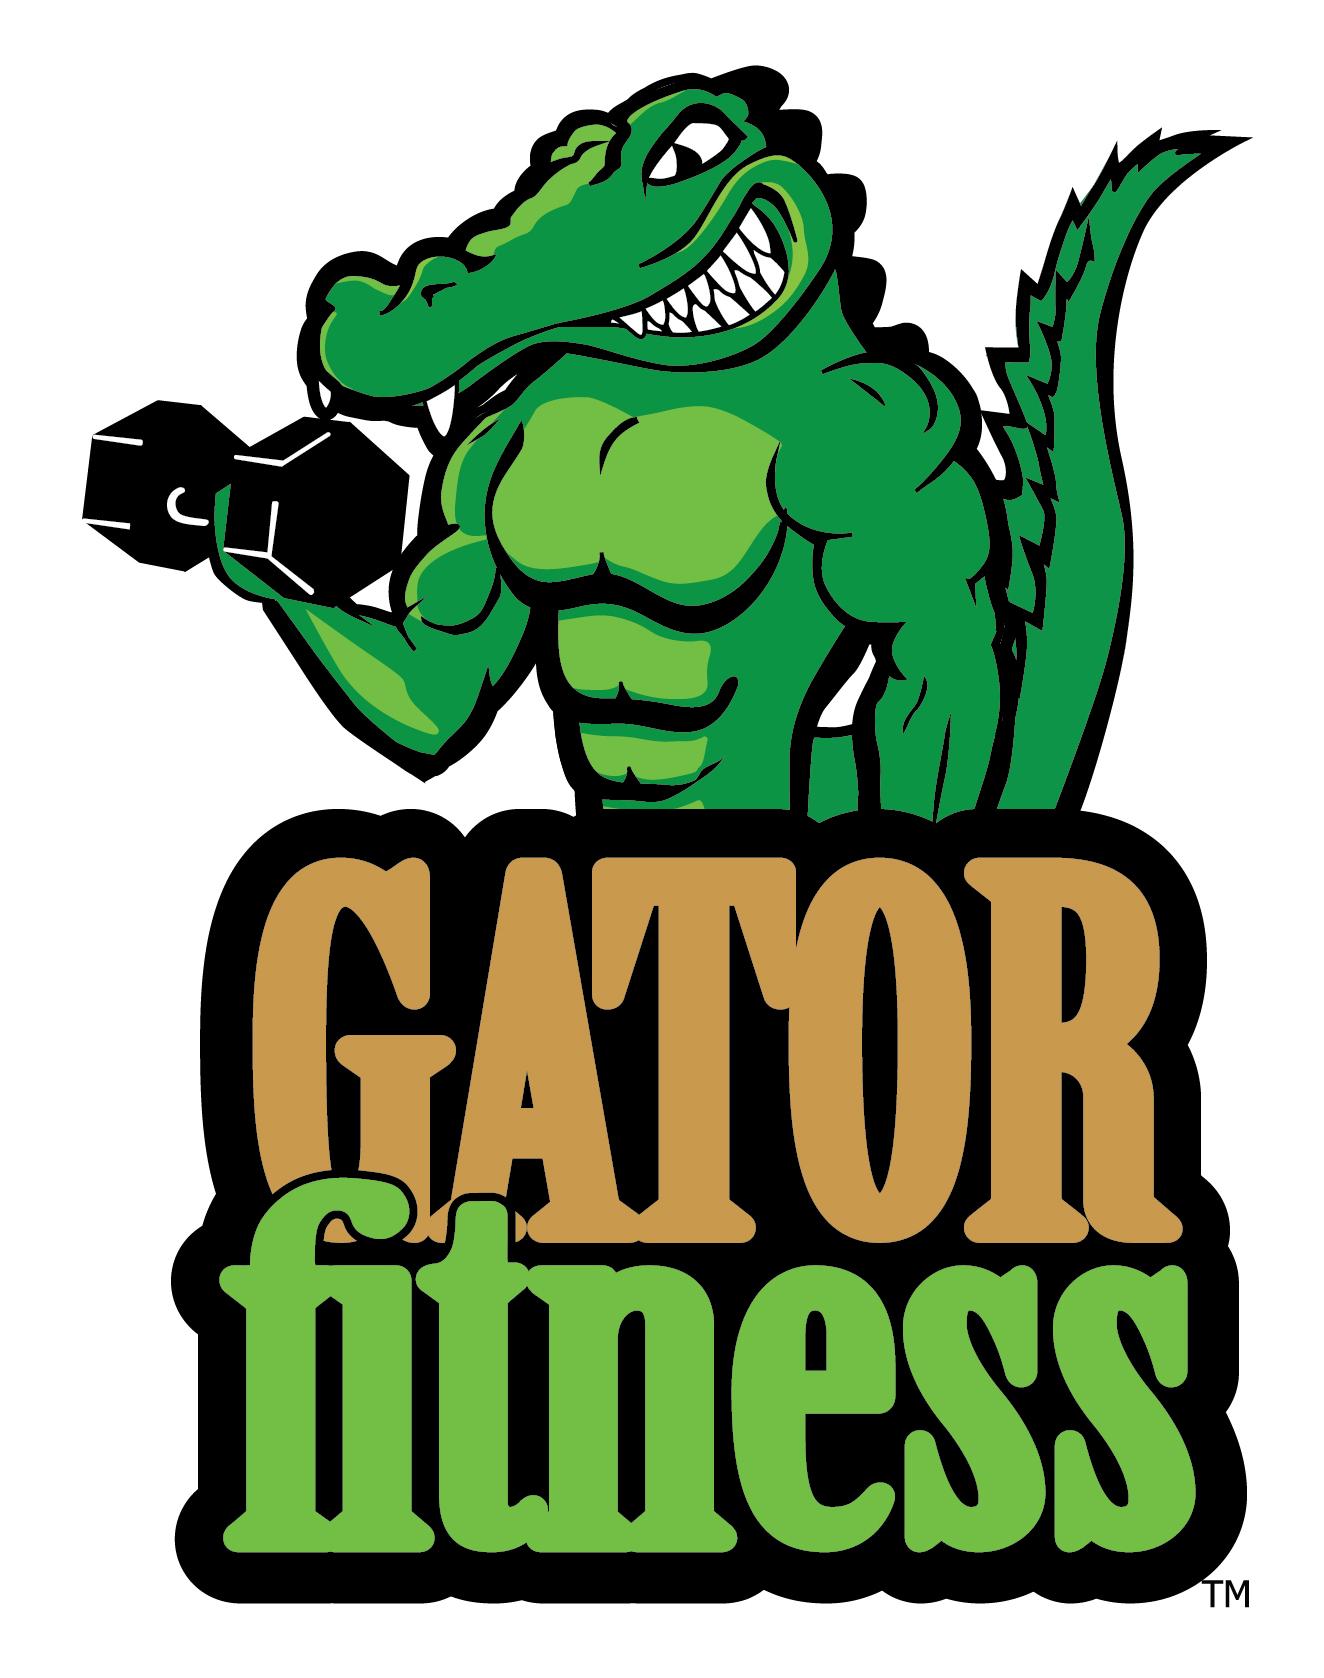 gator fitness logo